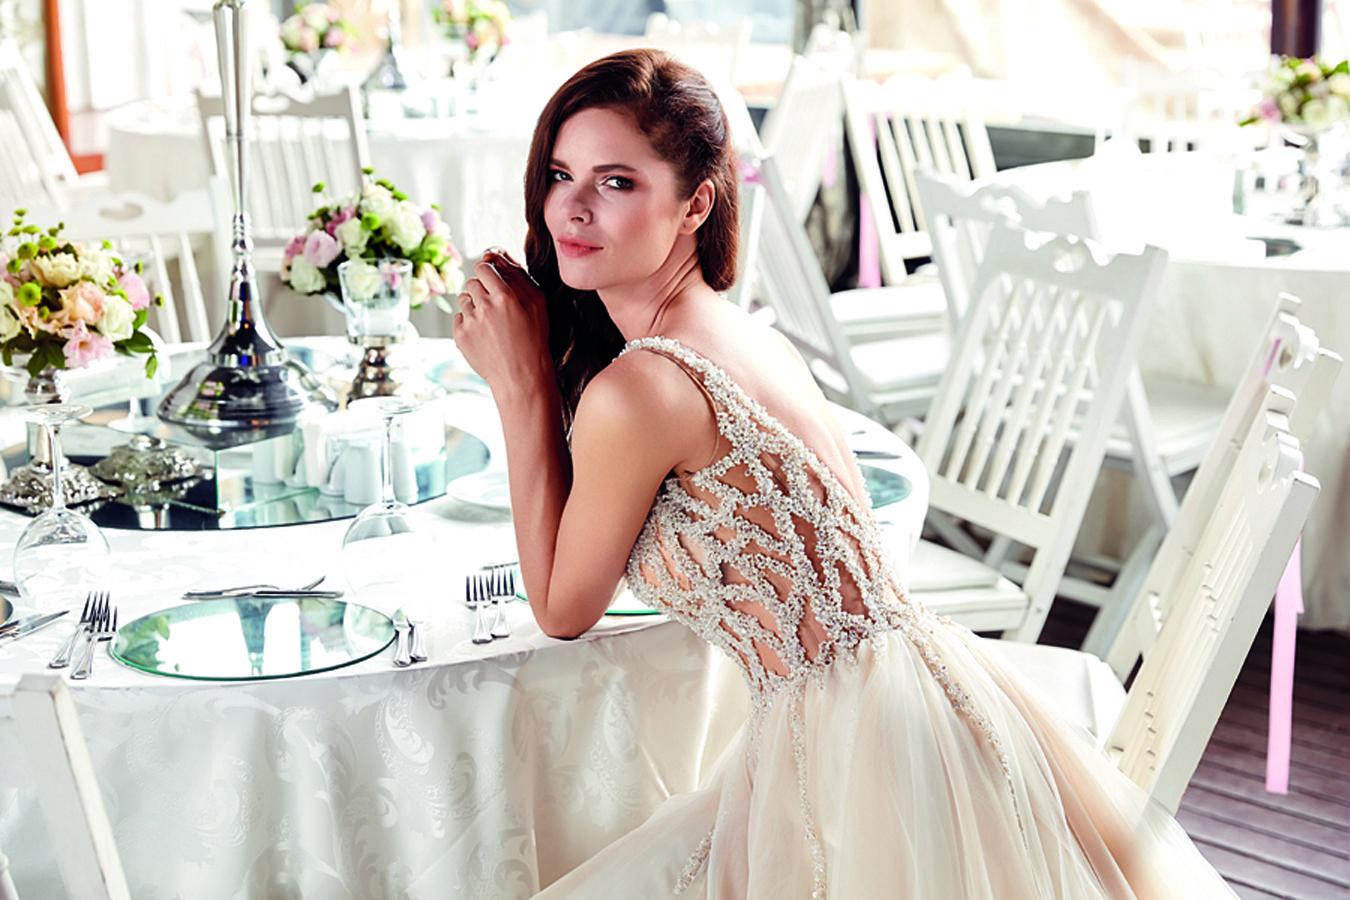 No lace wedding dress october 2018 lorem ipsum dolor sit  turkey   Pinterest  Lorem ipsum